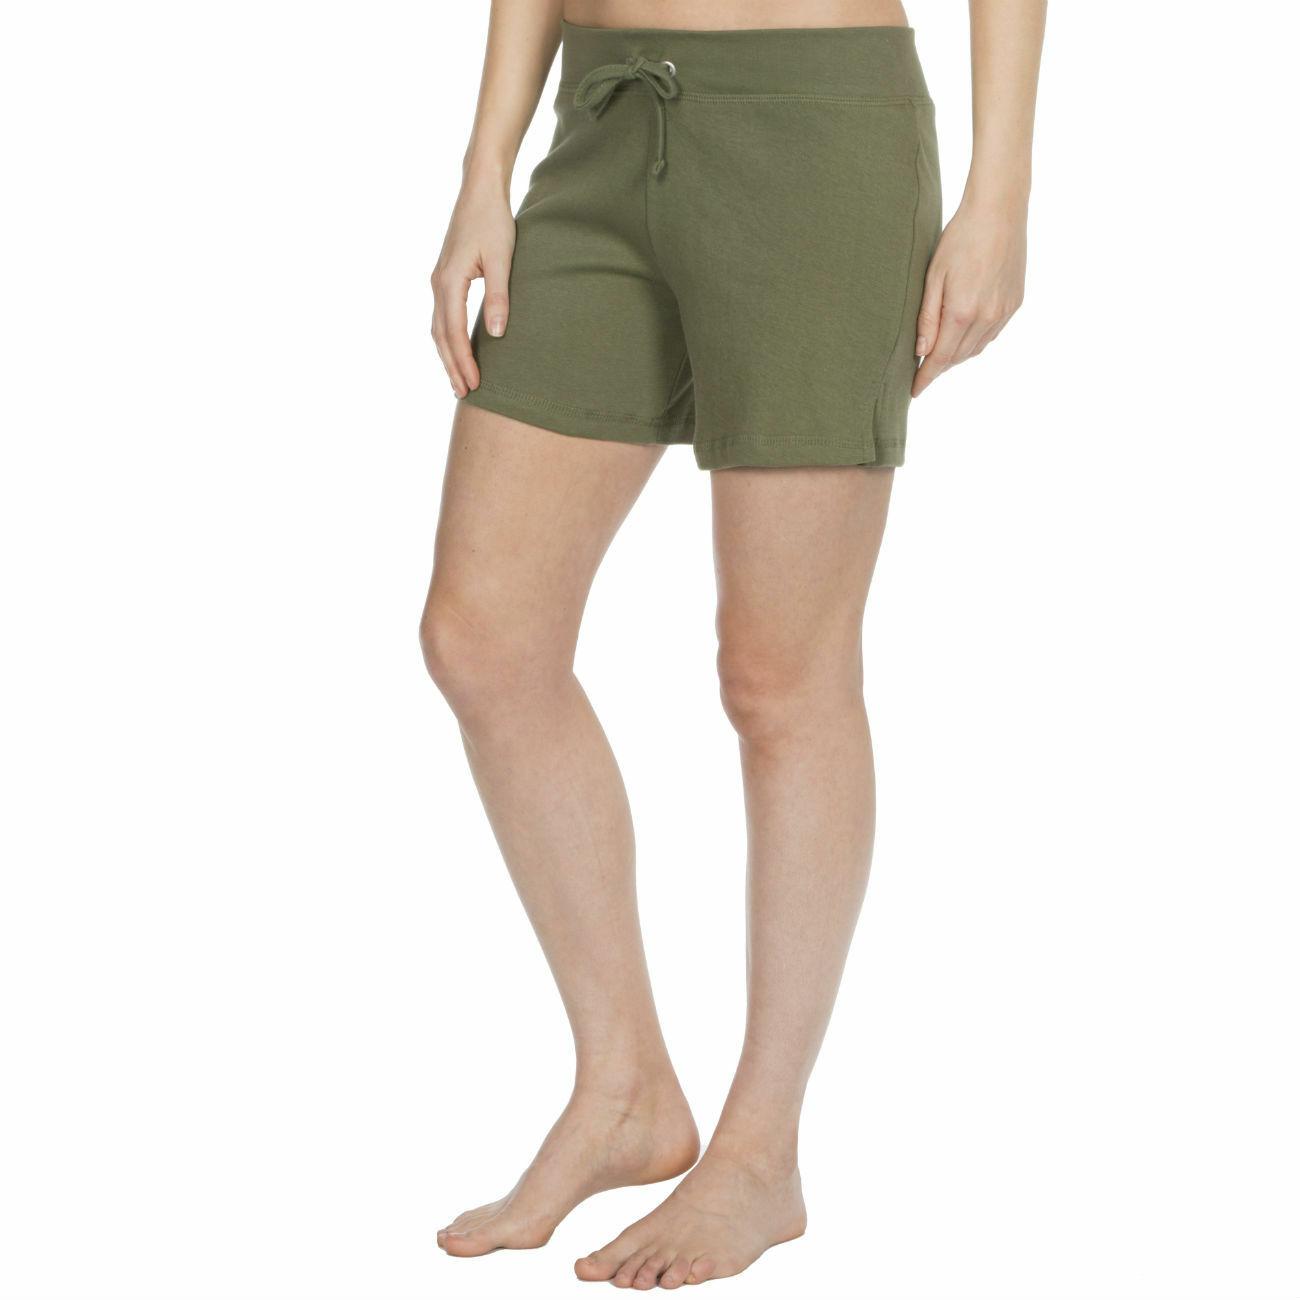 Womens-Cotton-Jersey-Shorts-Elastic-Waist-Summer-Beach-Casual-Yoga-Hot-Pants-New thumbnail 21